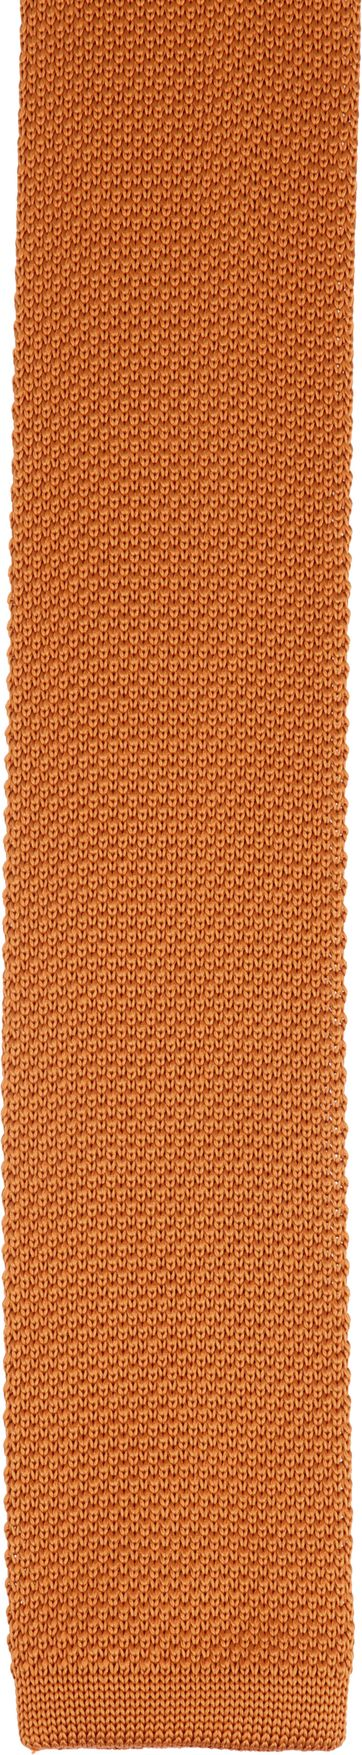 Suitable Knitted Krawatte Orange